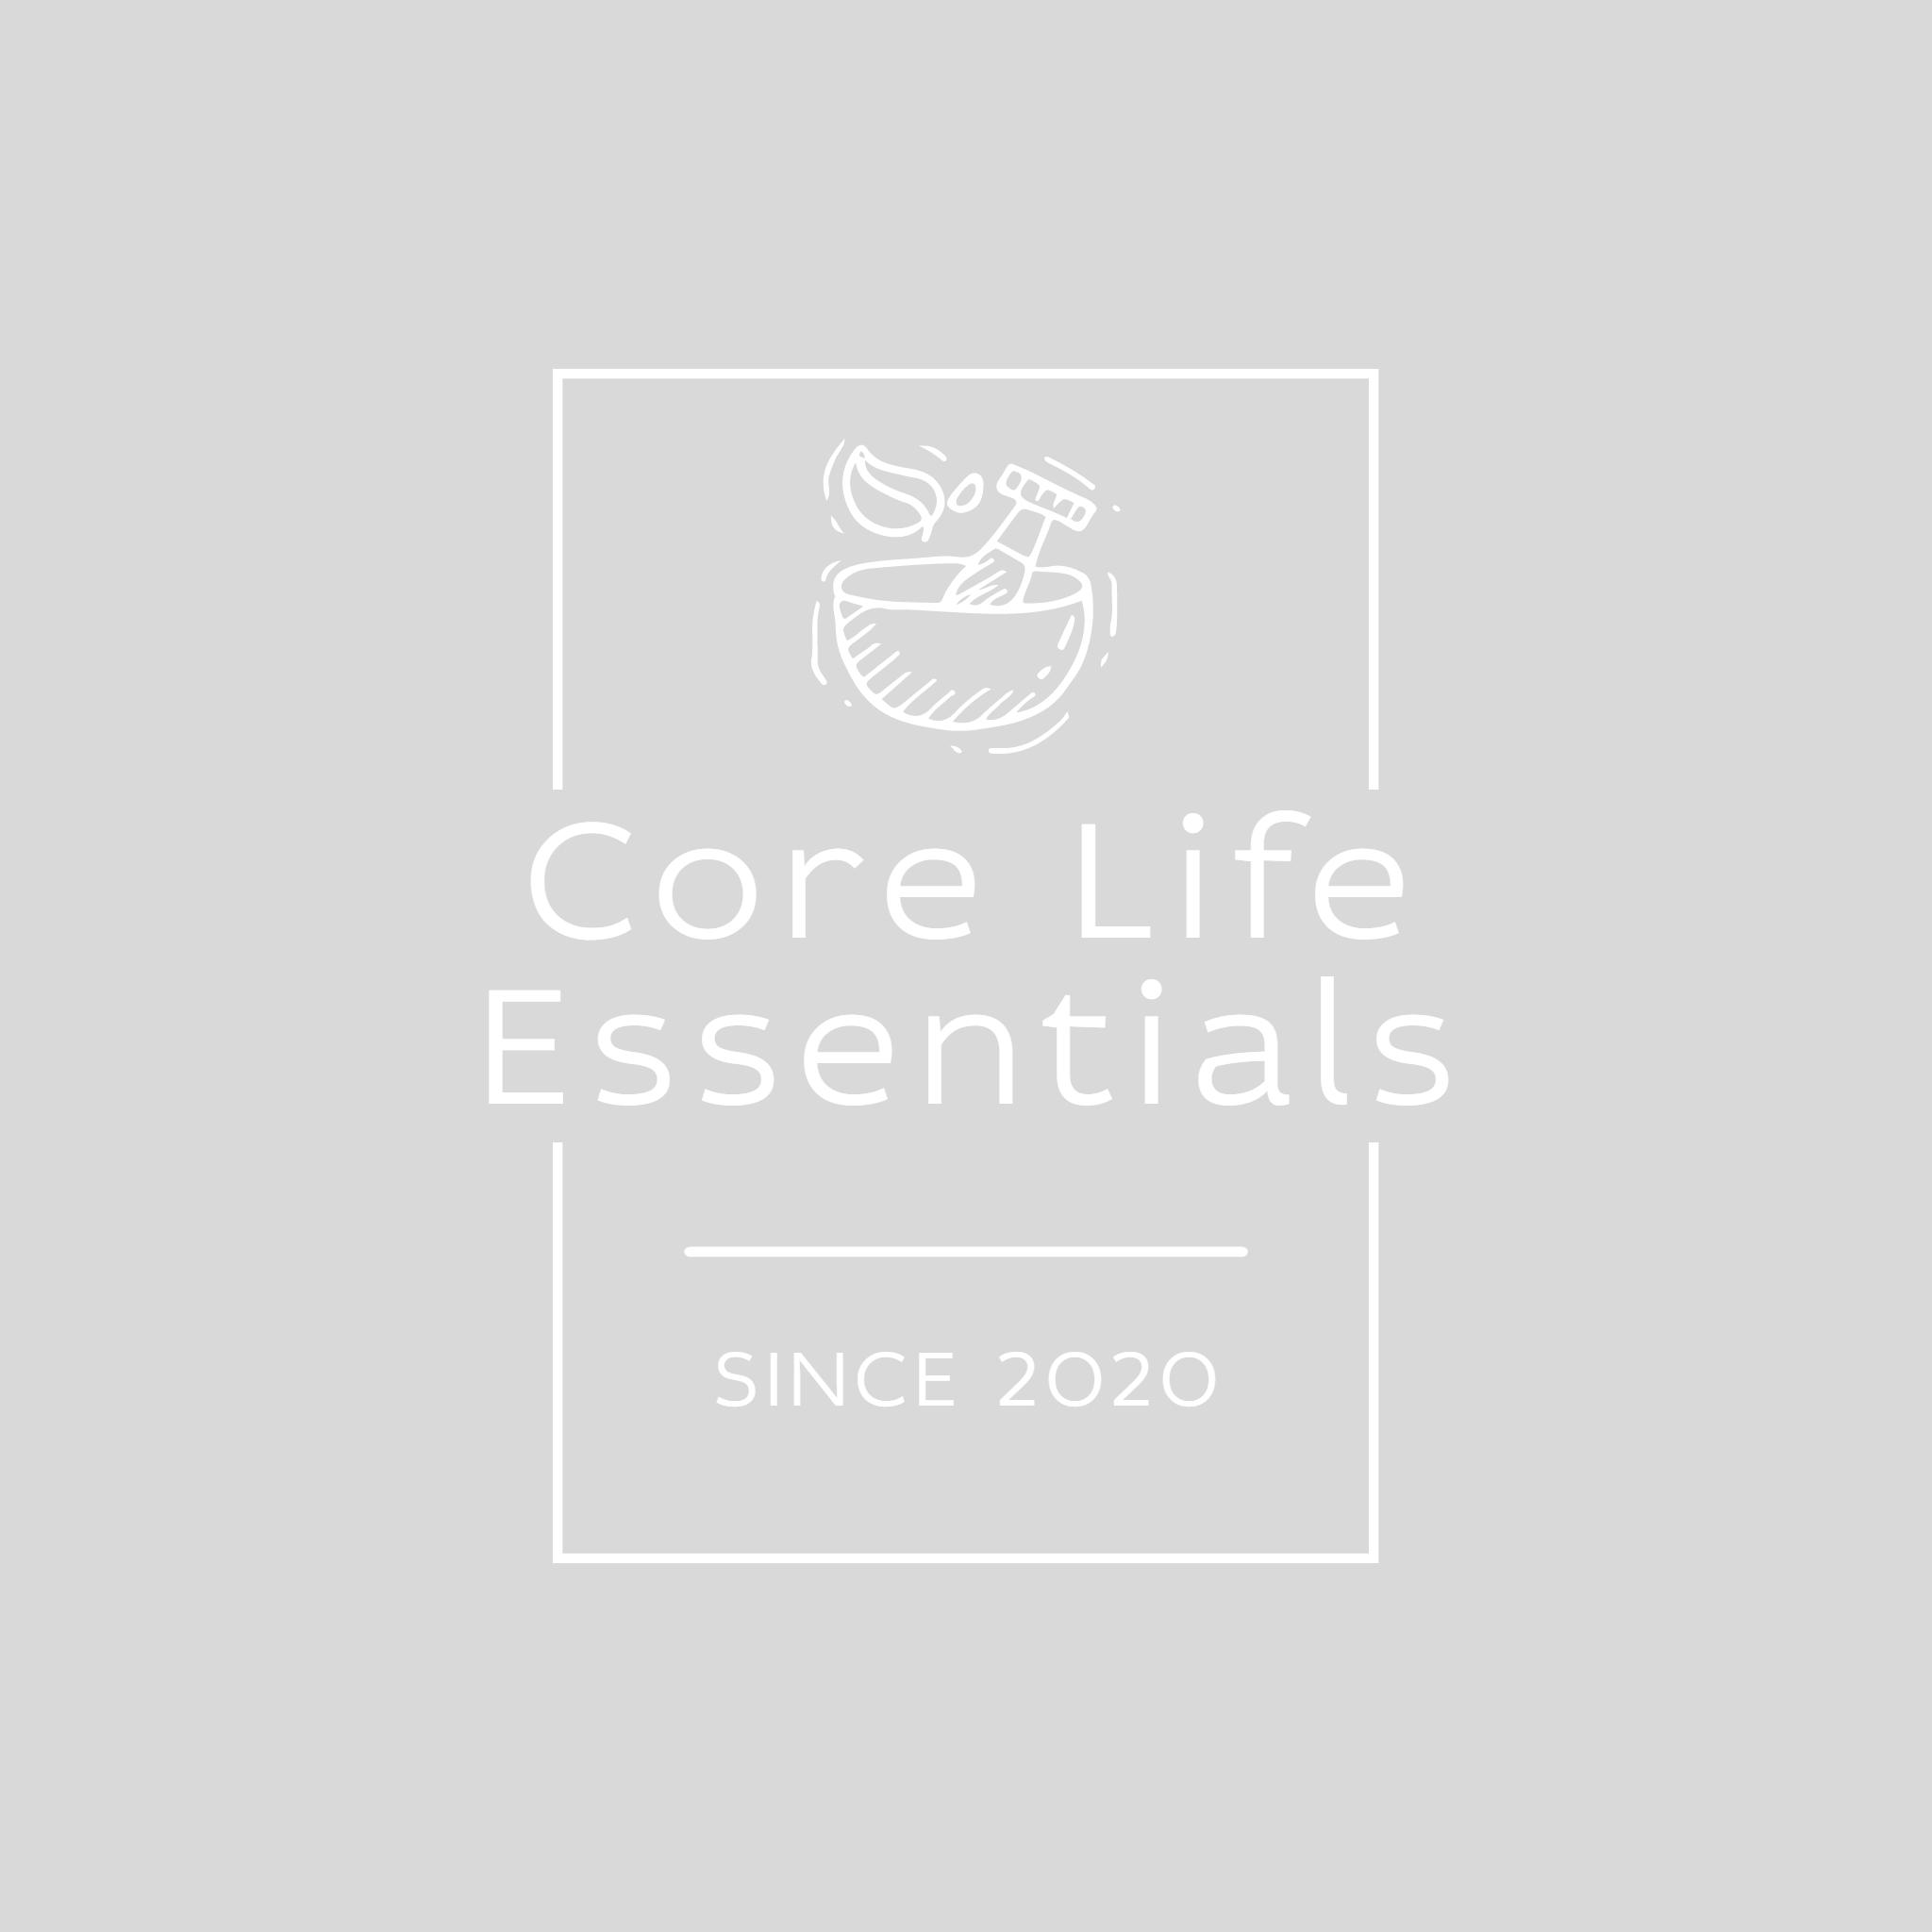 Core Life Essentials